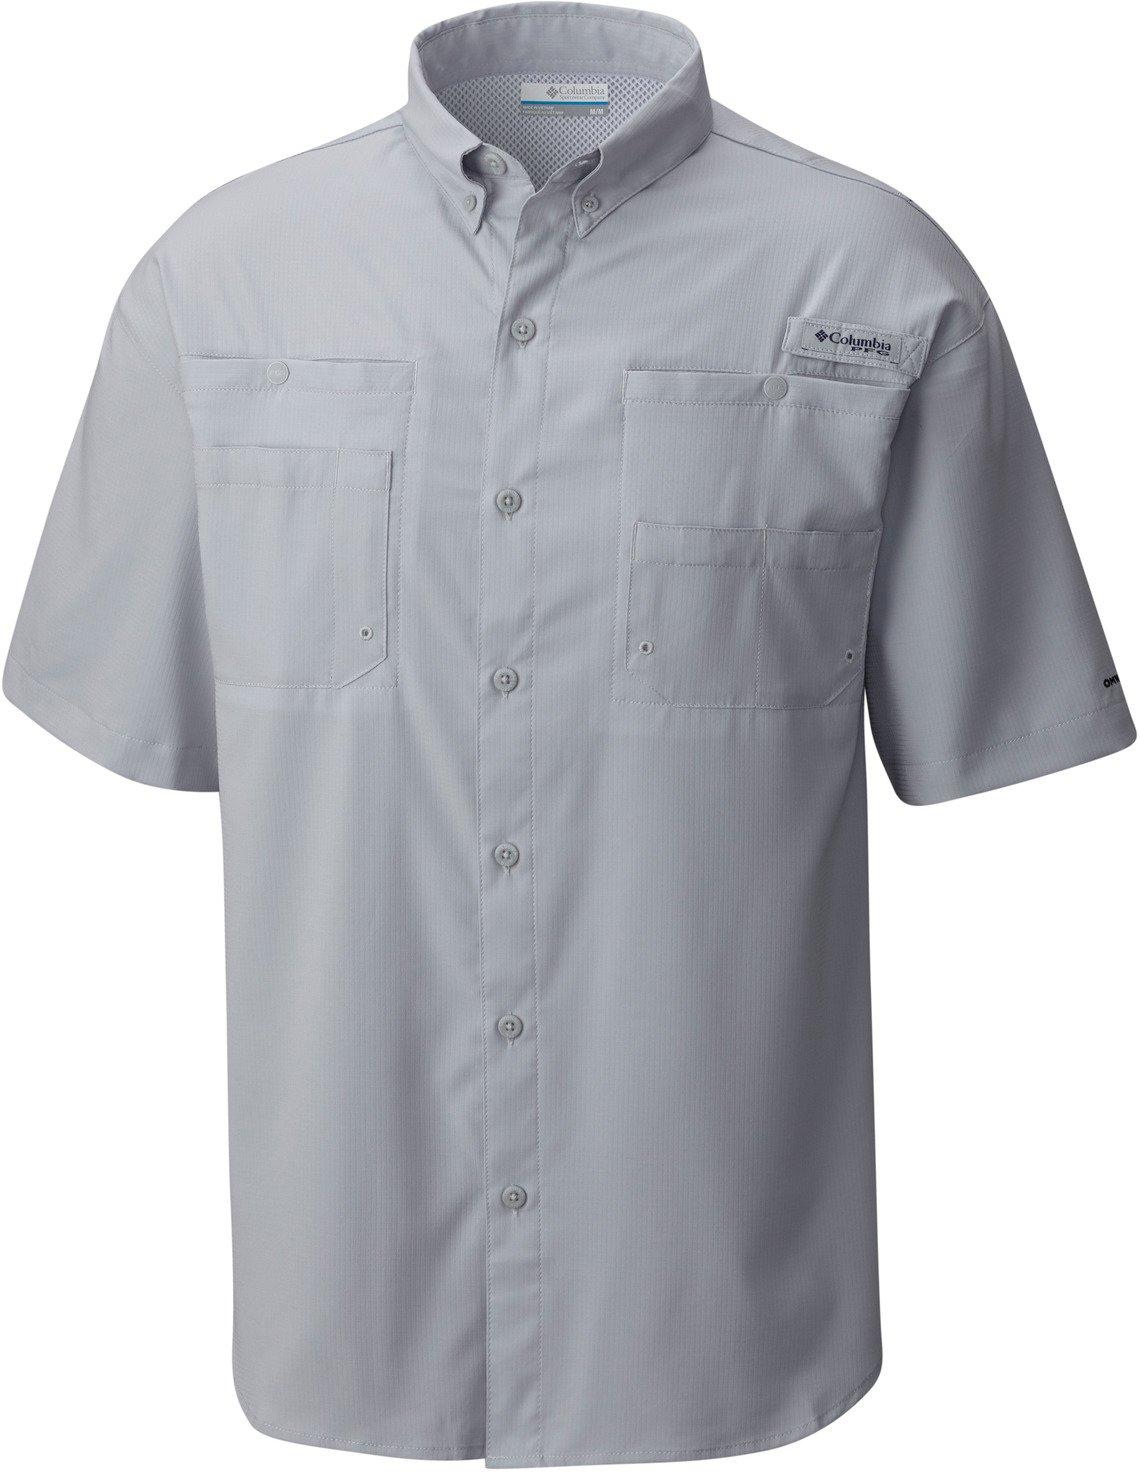 Display product reviews for Columbia Sportswear Men s Tamiami II Shirt 783029459b560